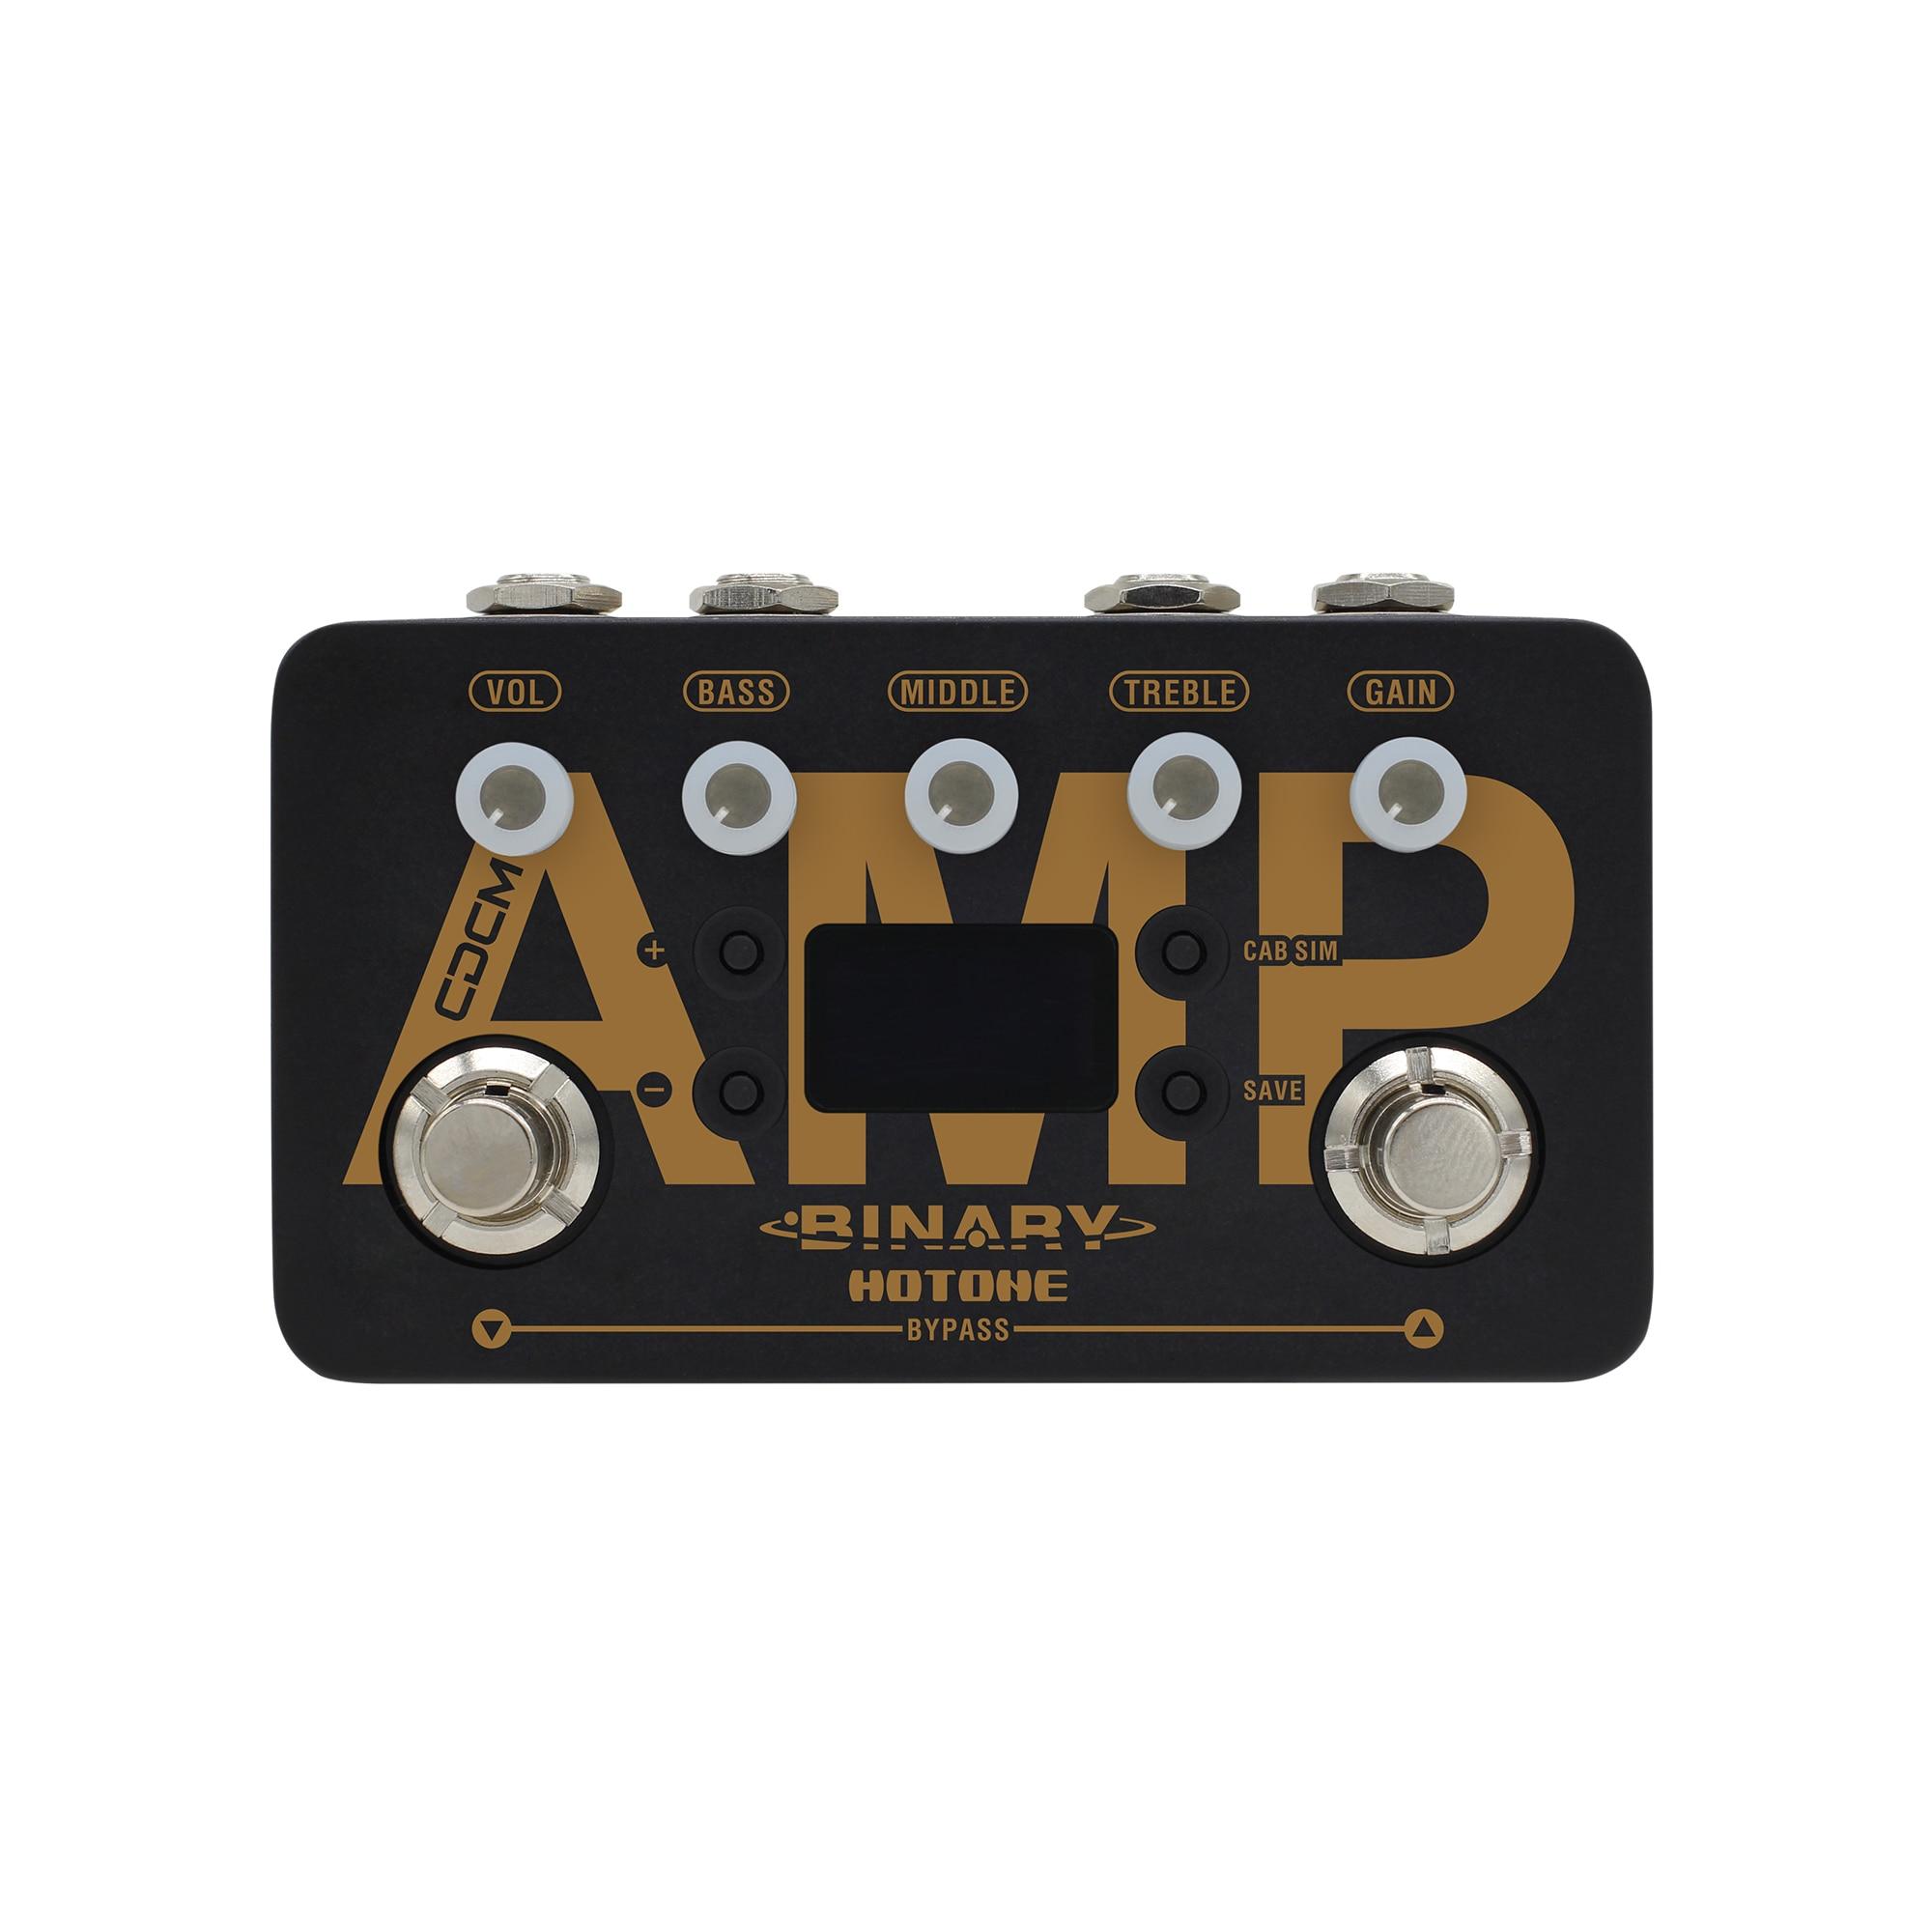 hotone binary amp cdcm amplifier simulator effects pedal dual dsp powered platform electric. Black Bedroom Furniture Sets. Home Design Ideas